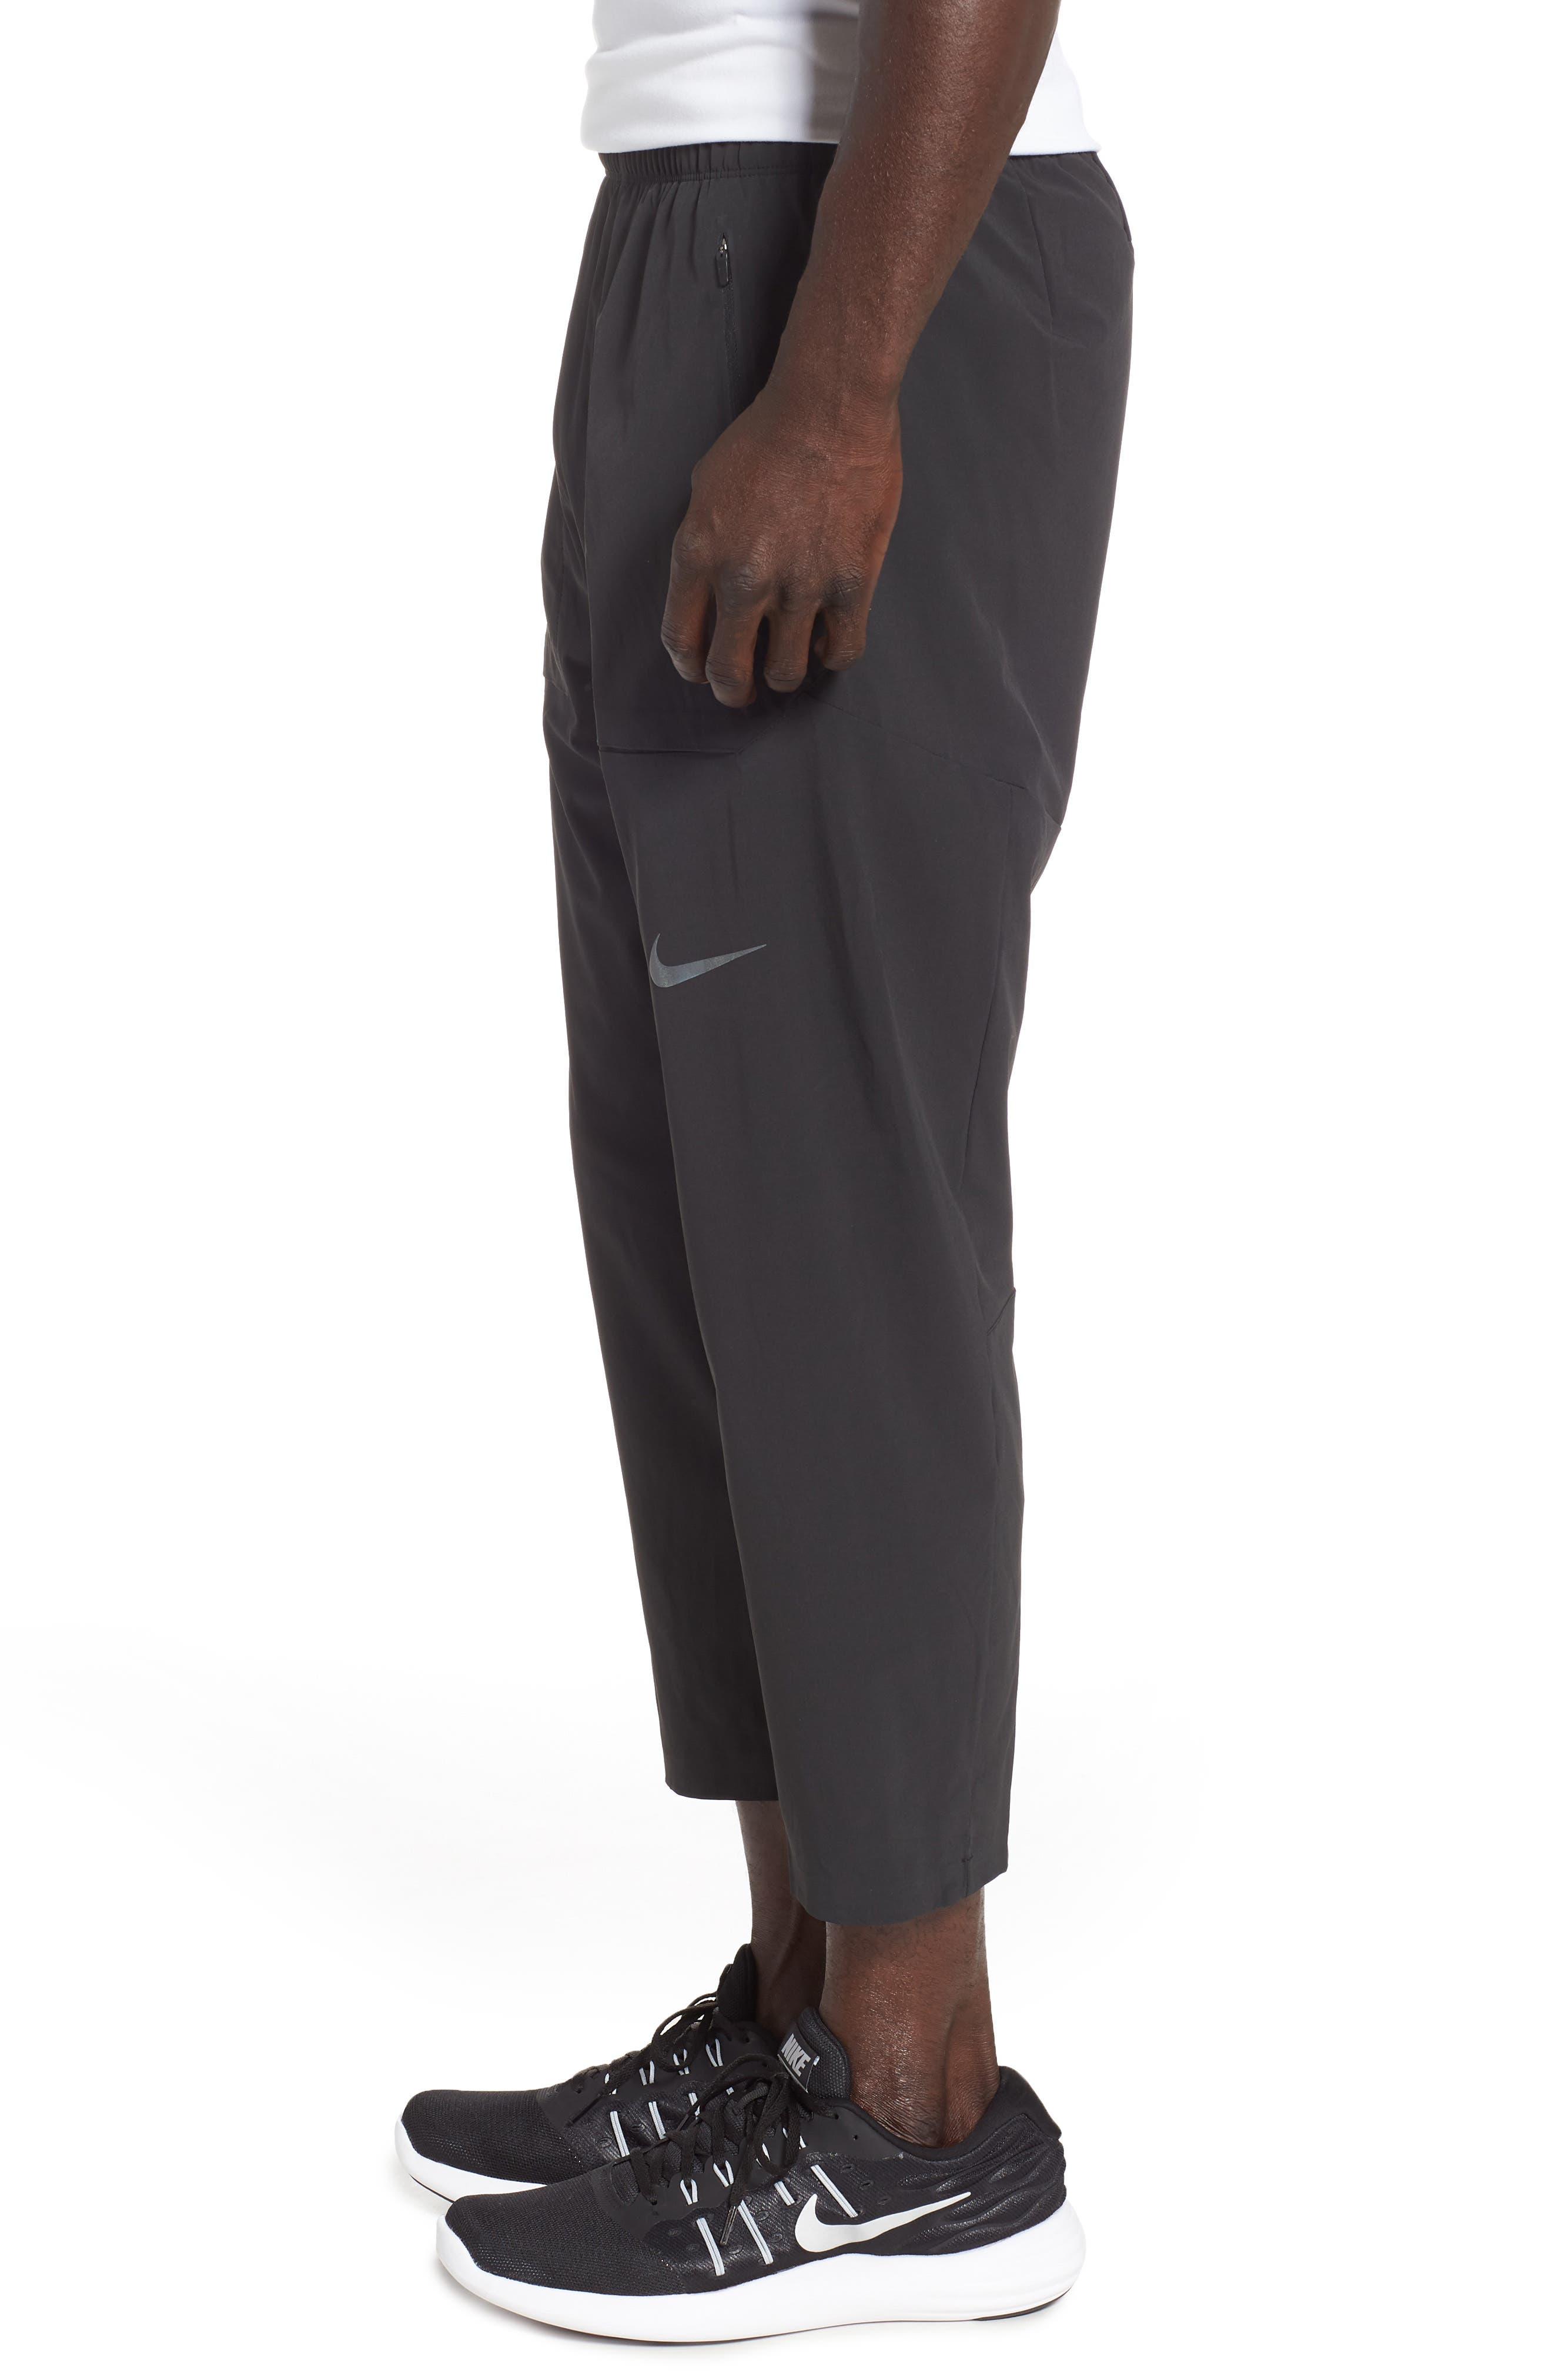 Run Division Running Pants,                             Alternate thumbnail 3, color,                             BLACK/ BLACK